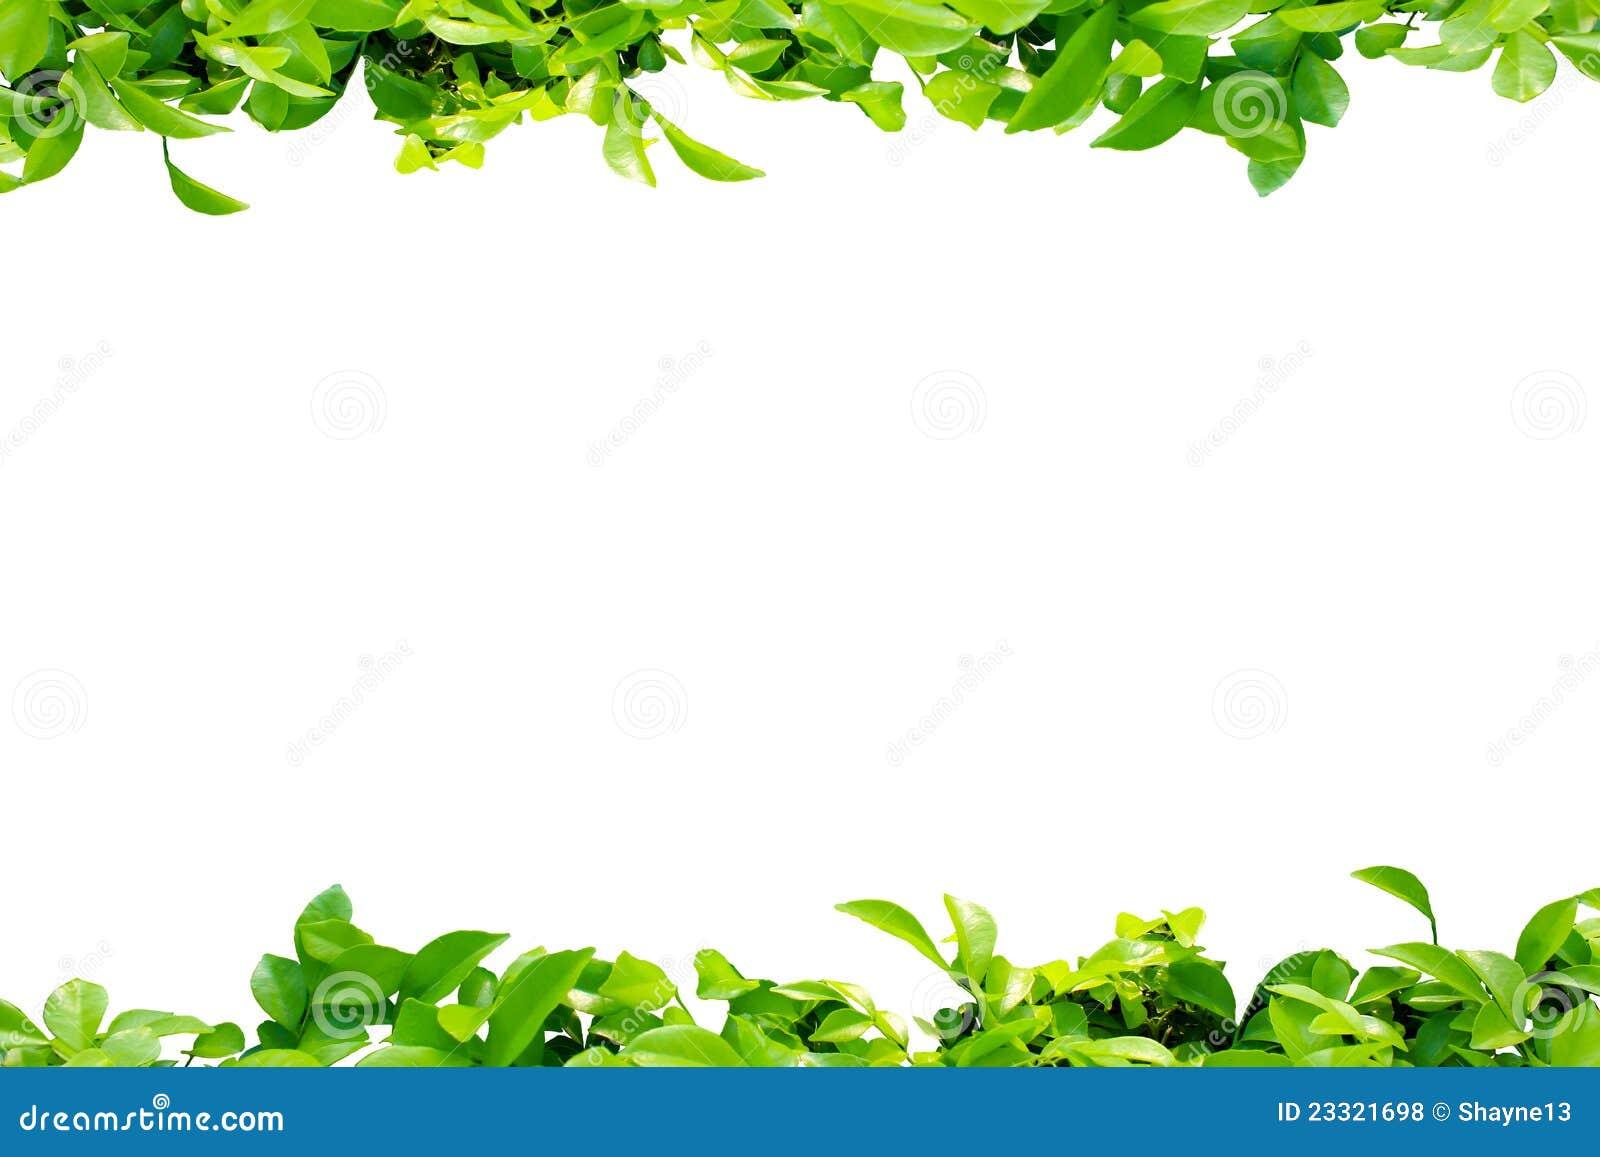 Leaf border stock photo. Image of nature, frame, garden - 23321698